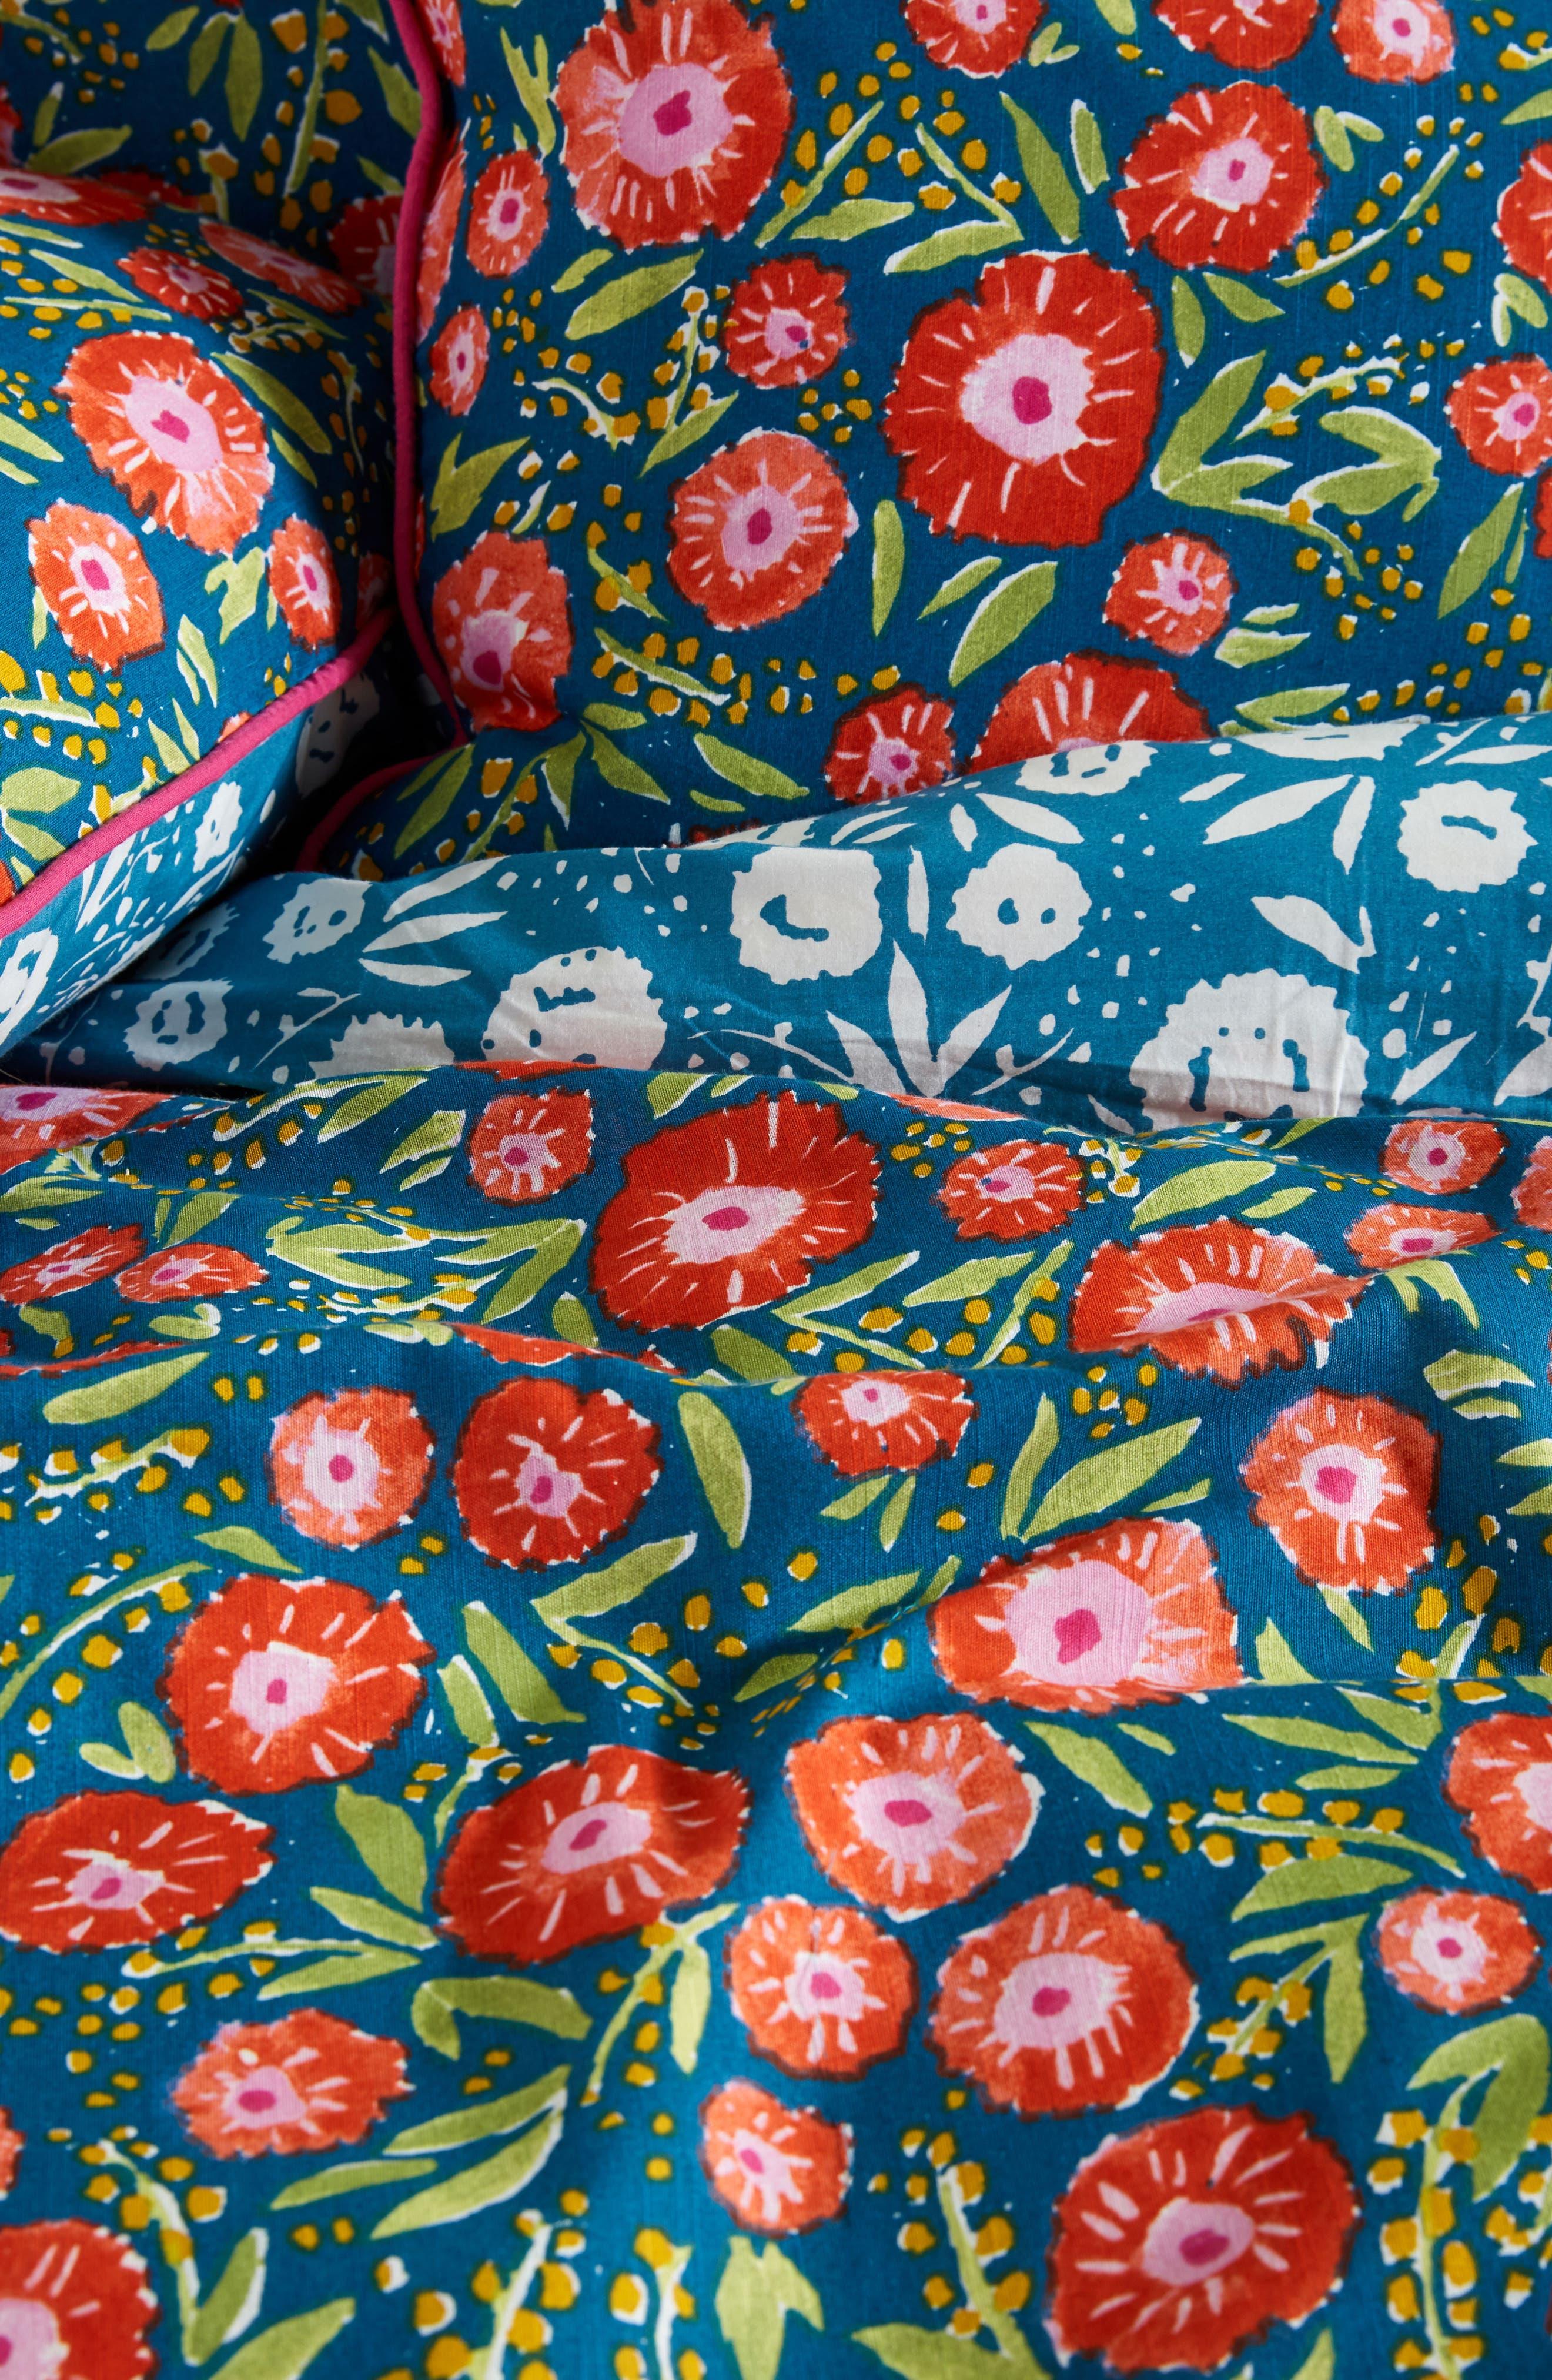 Painted Poppies Duvet Cover,                             Alternate thumbnail 2, color,                             Blue